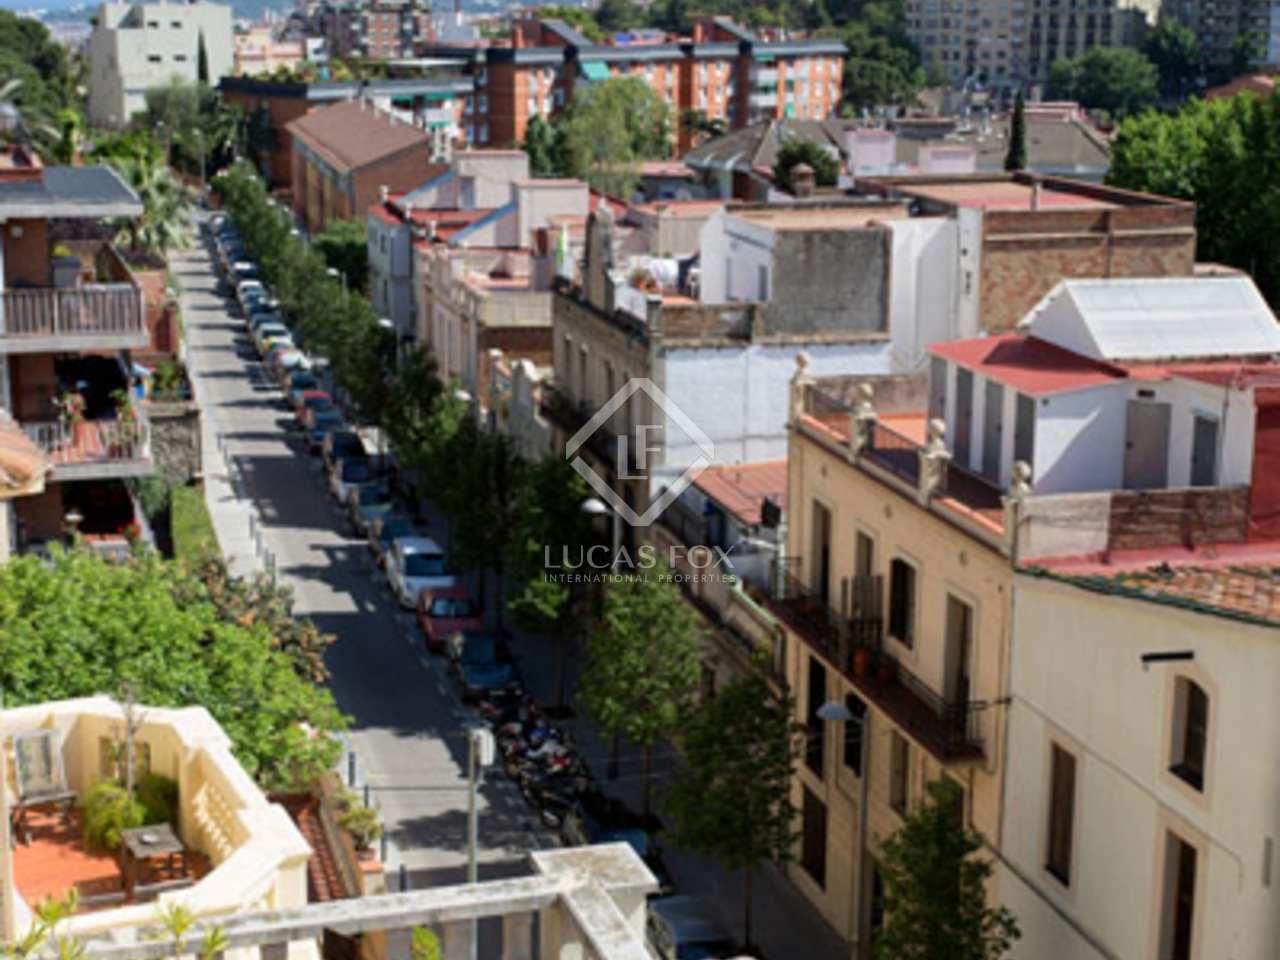 Detached house for sale in barcelona zona alta - Zona alta barcelona ...